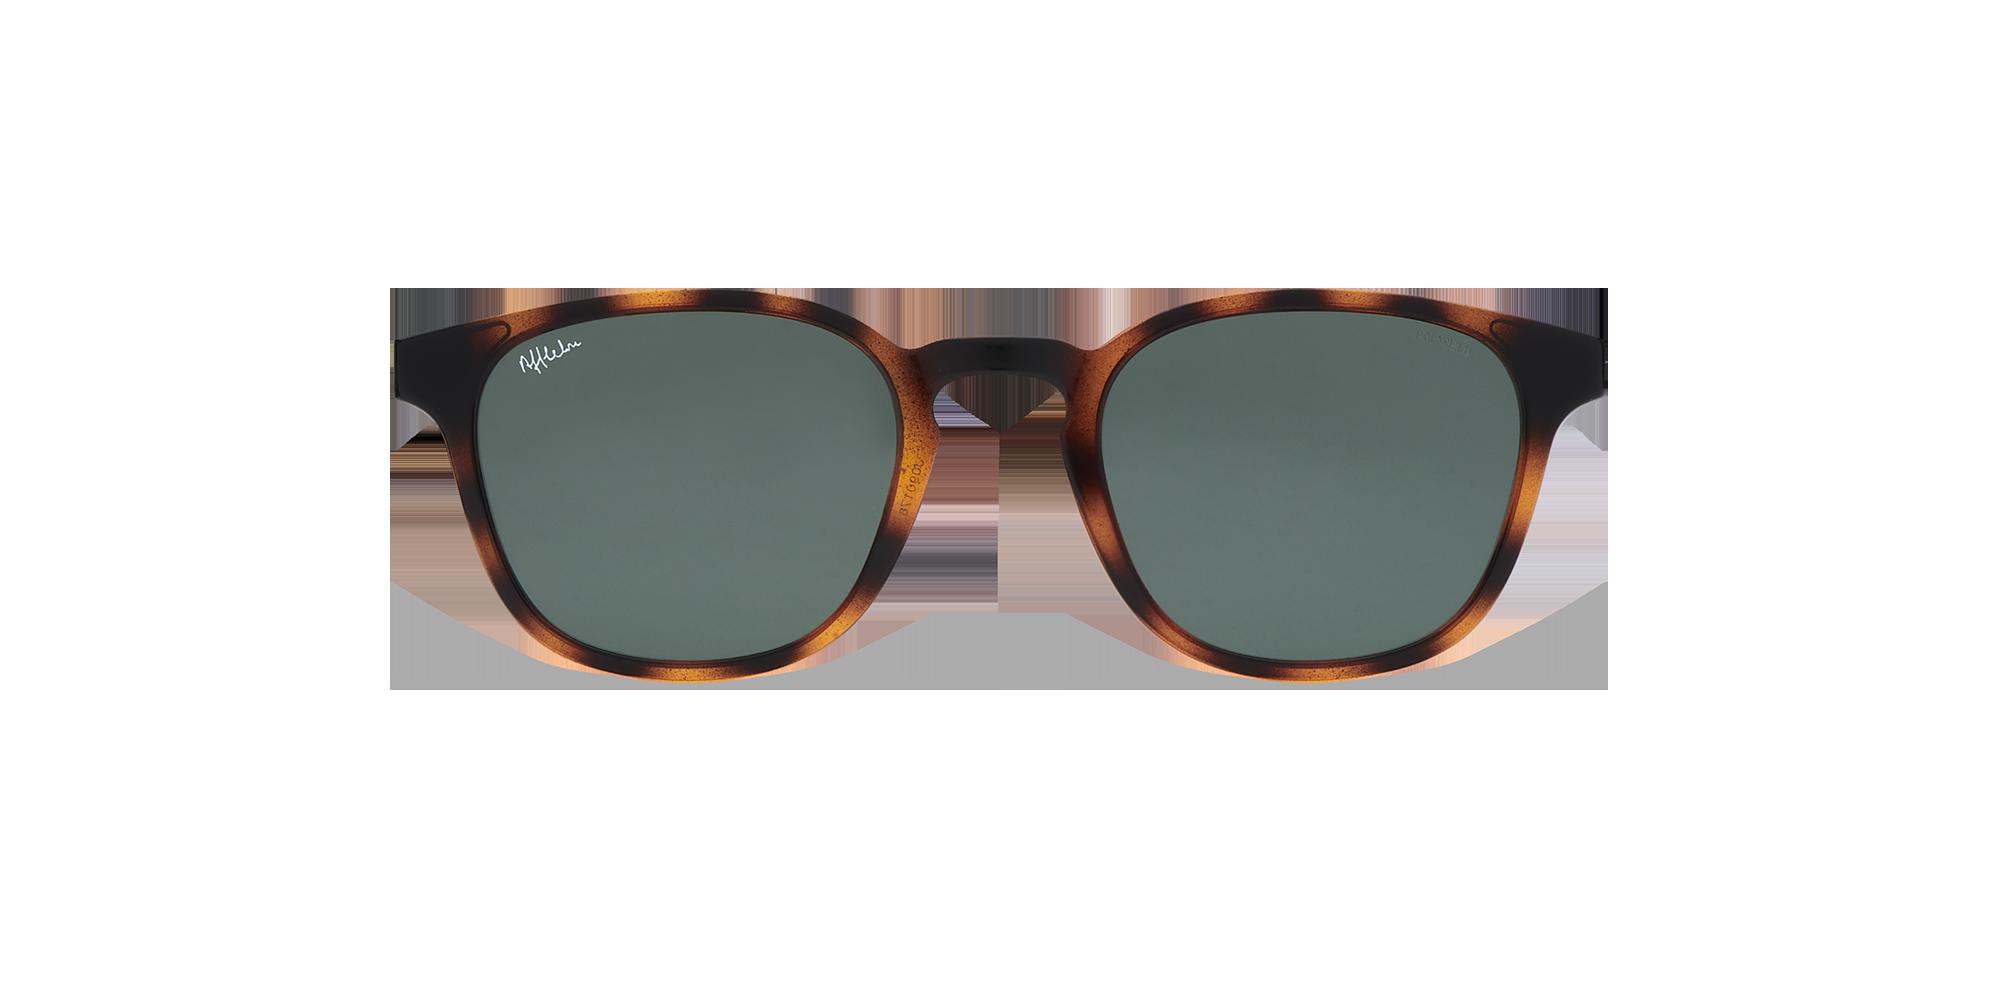 afflelou/france/products/smart_clip/clips_glasses/07630036429198_face.png